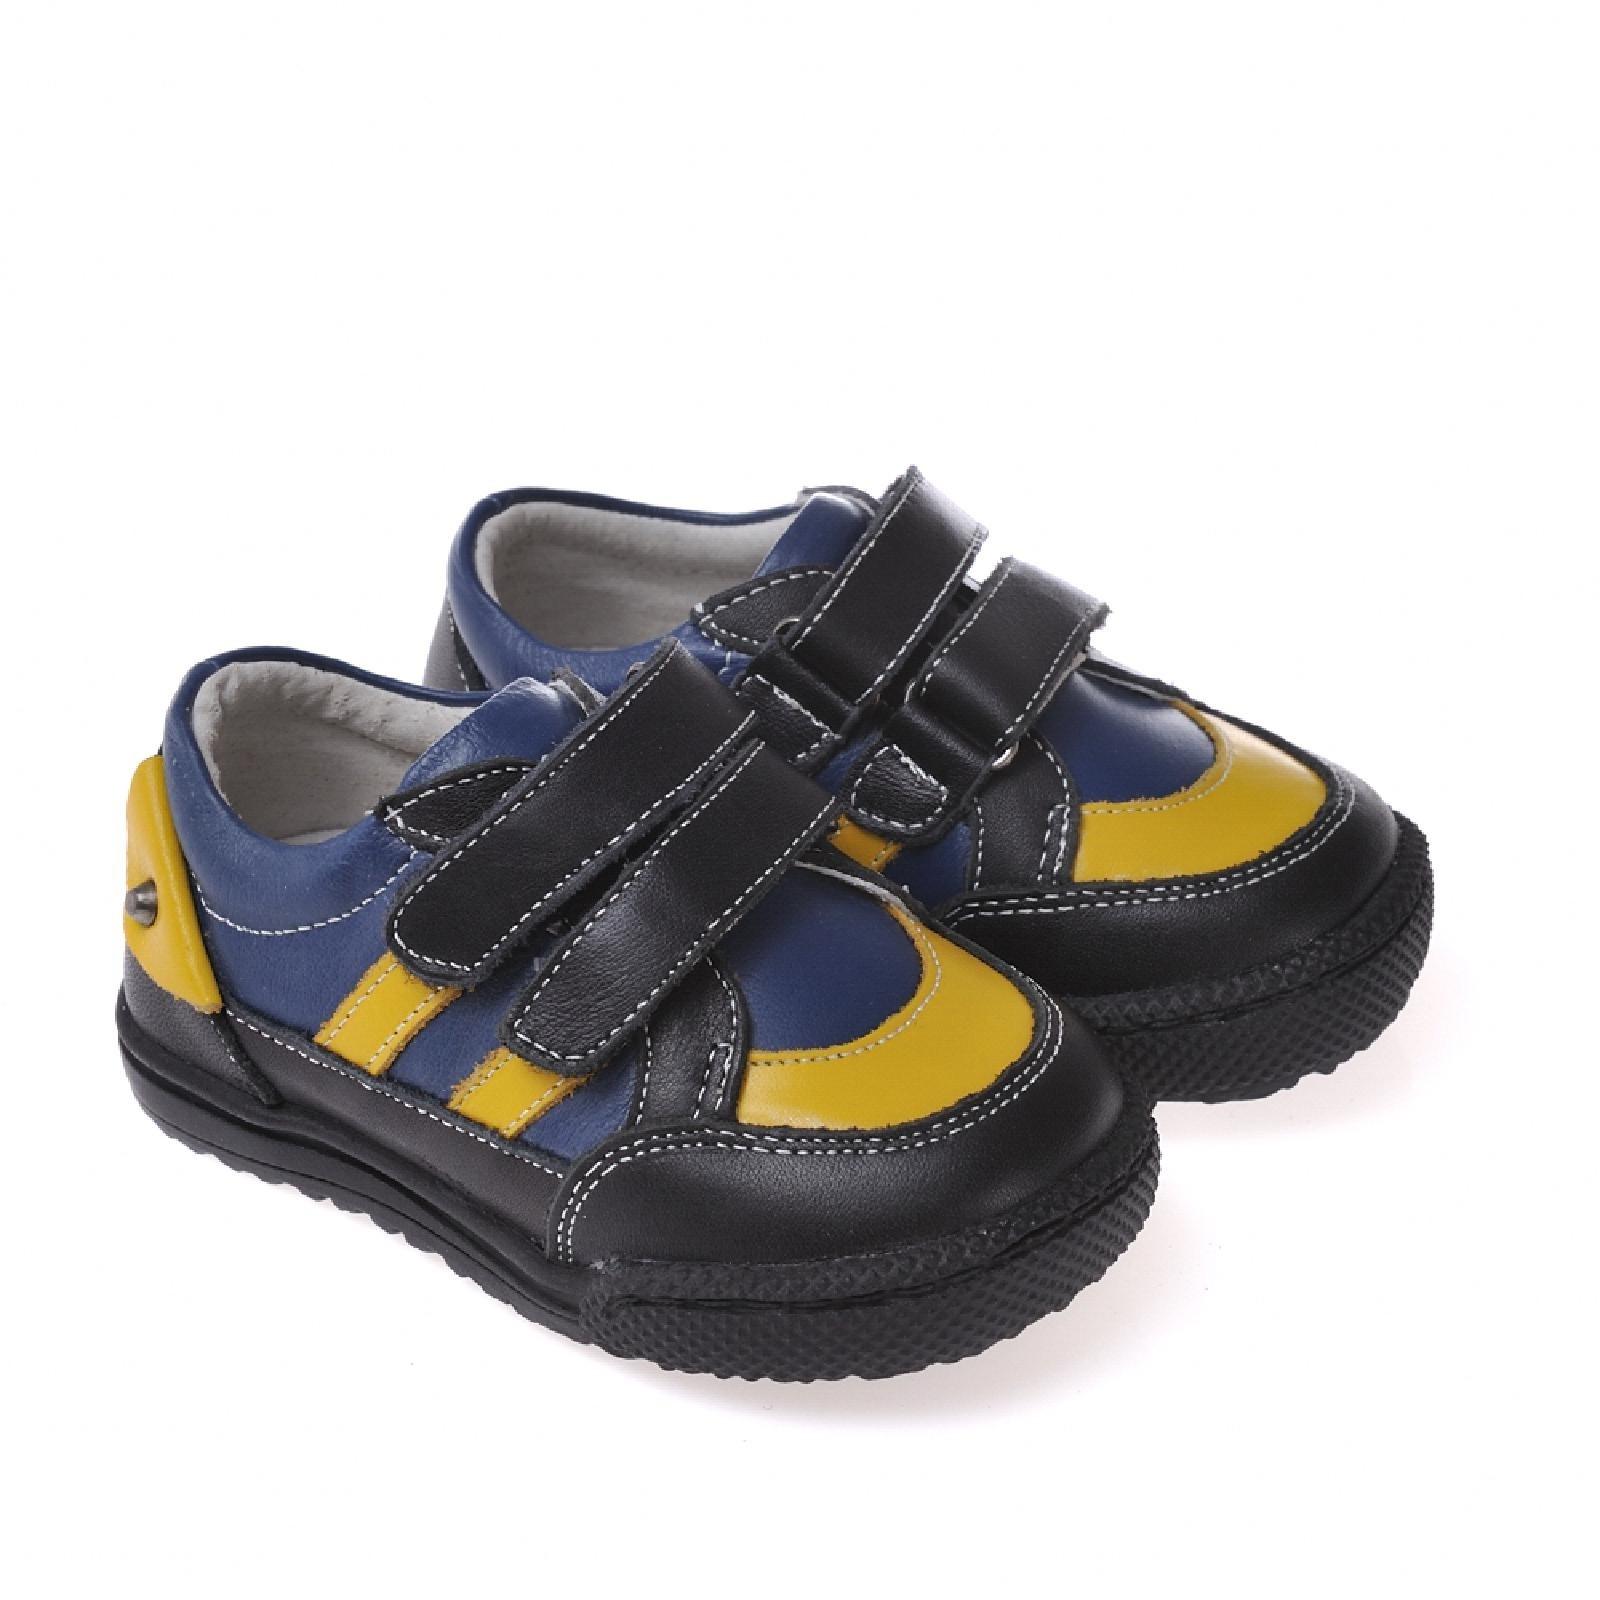 Caroch Jungen Sneaker  Kinderschuhe aus Leder in schwarz/blau